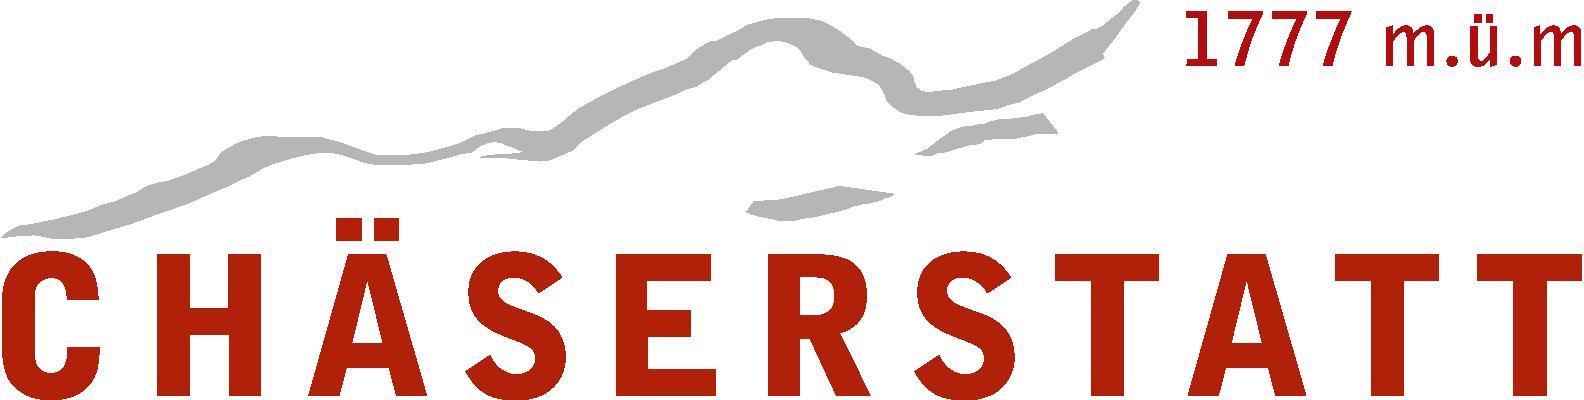 Chaeserstatt_Logo Partenaire_SwissPeaks.png